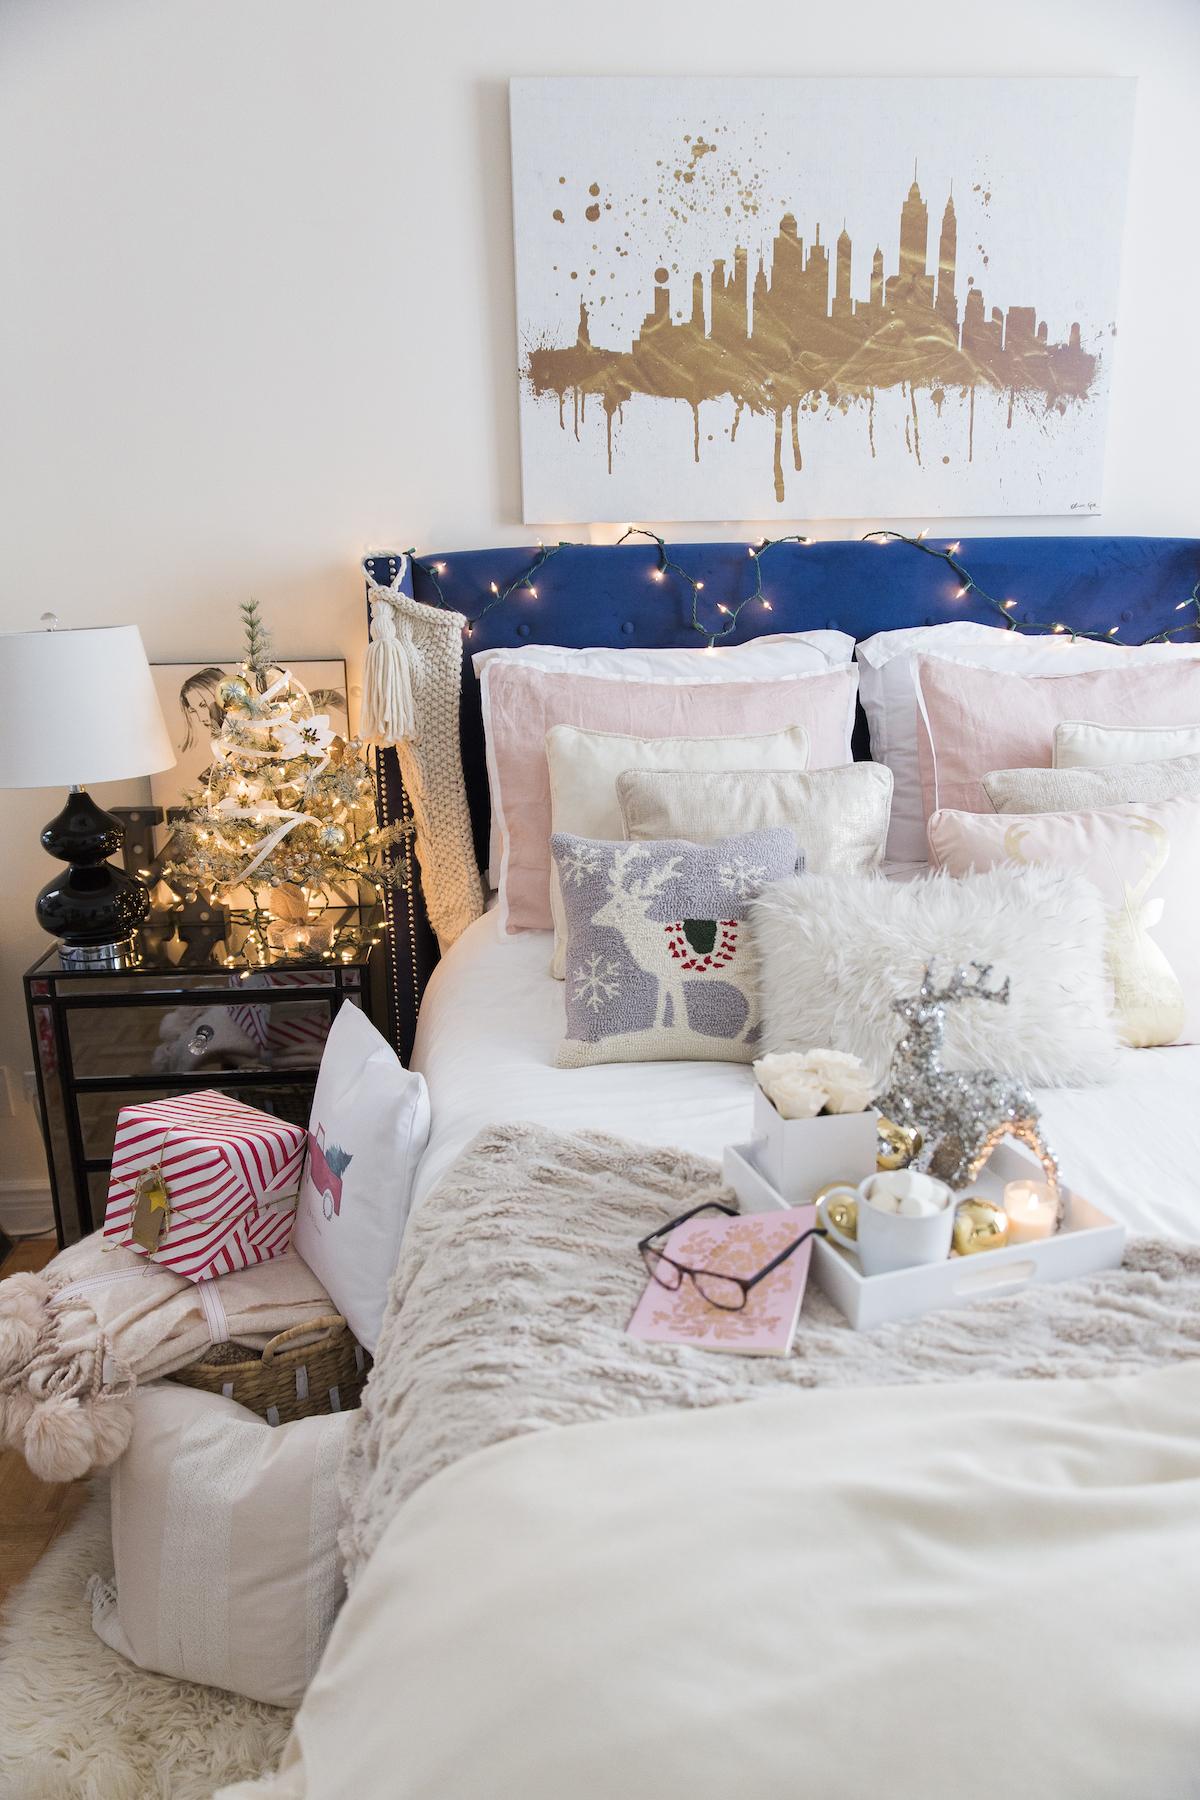 Cozy Holiday Bedroom Decorations